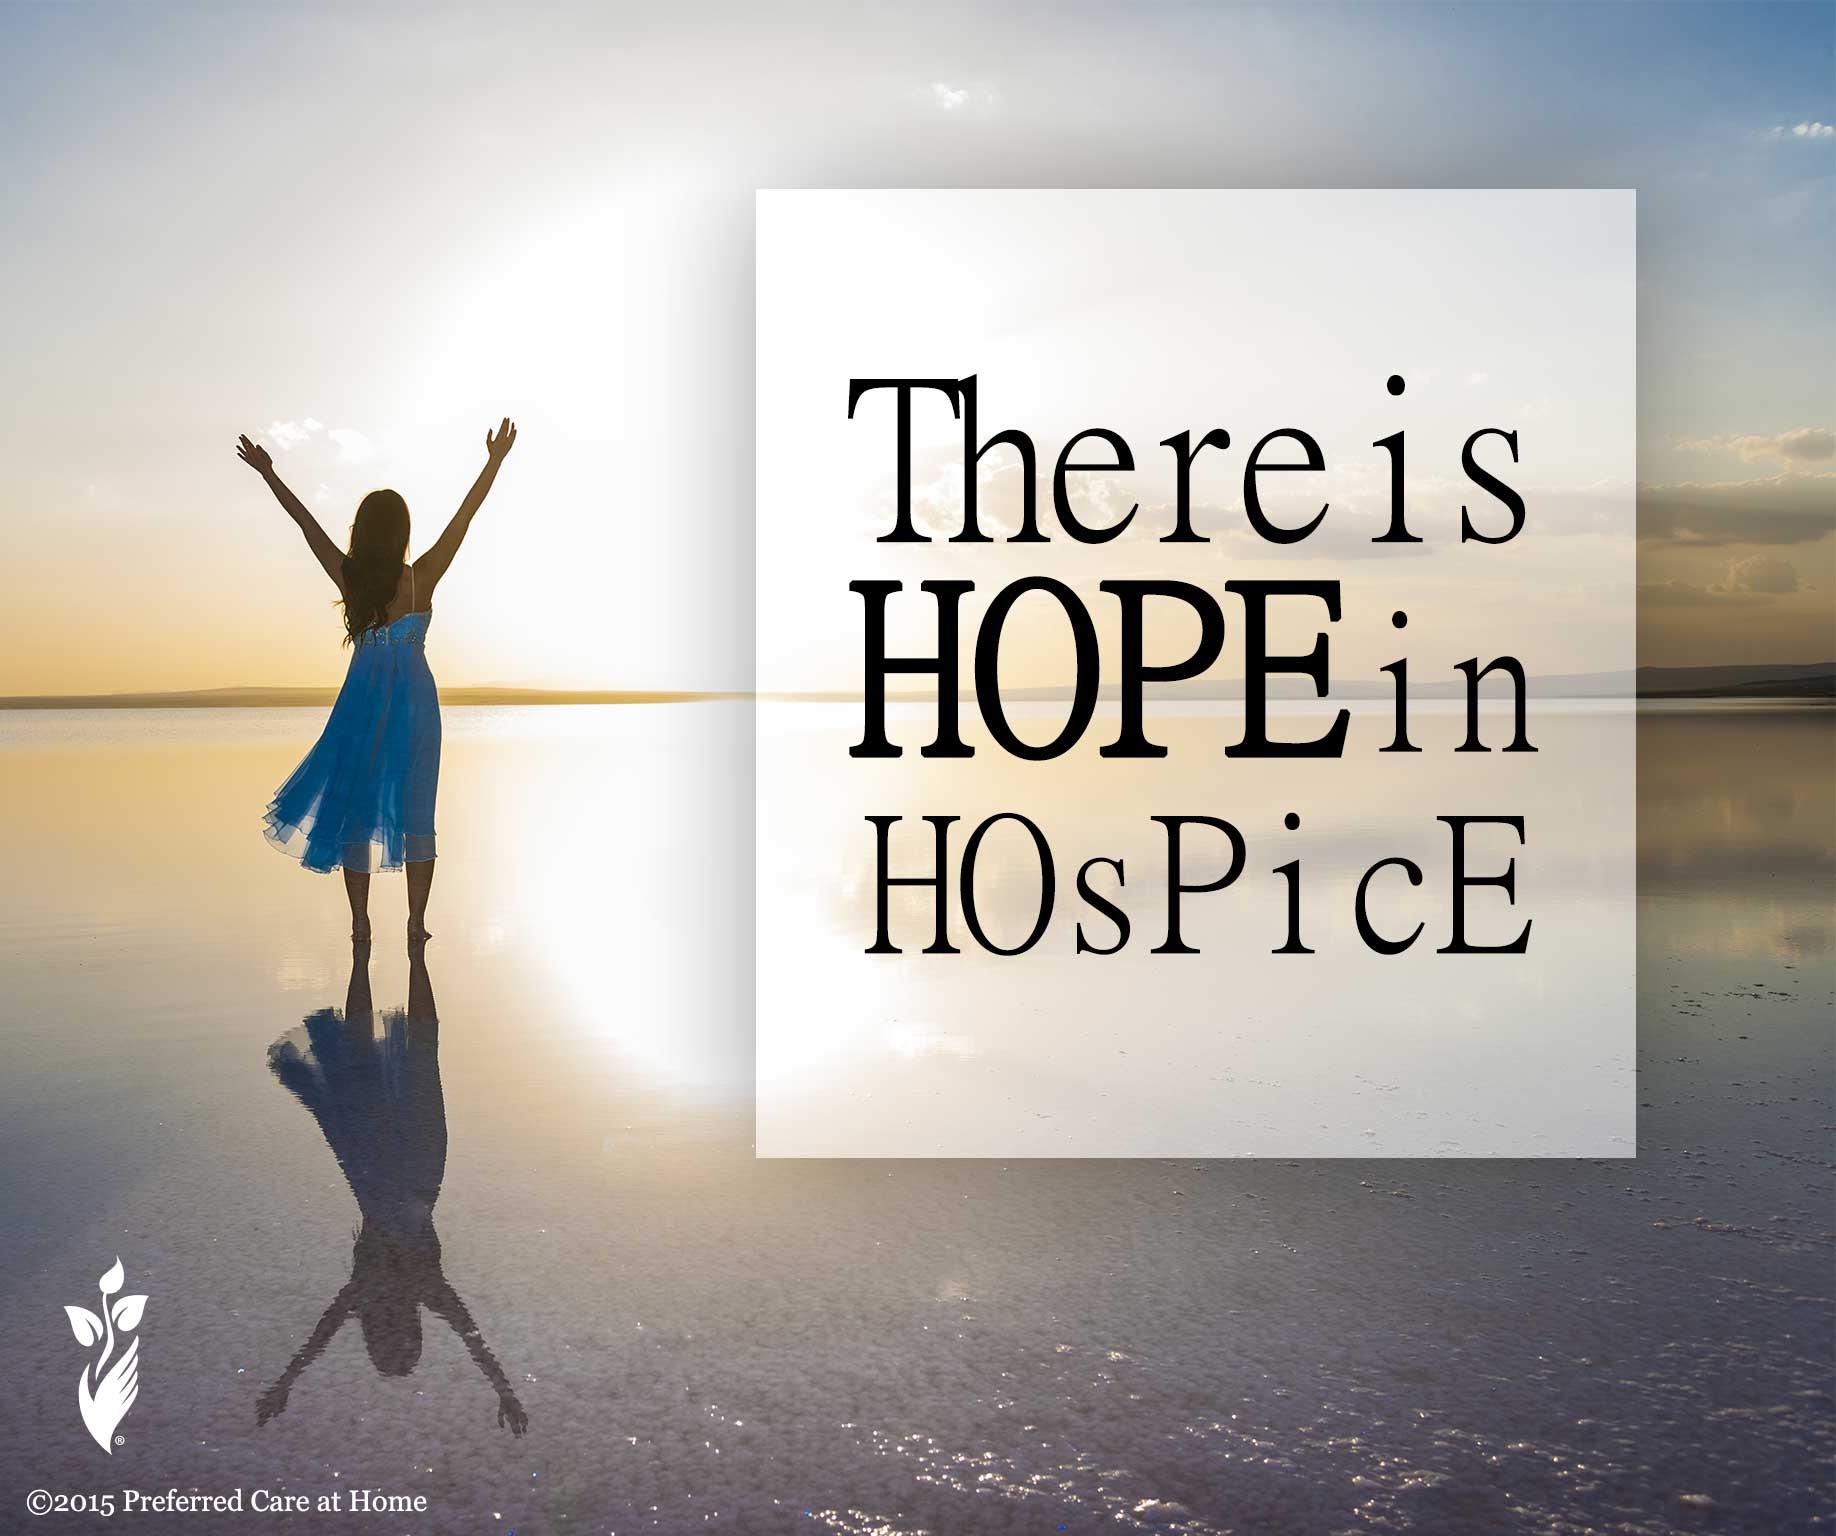 hospice_hope